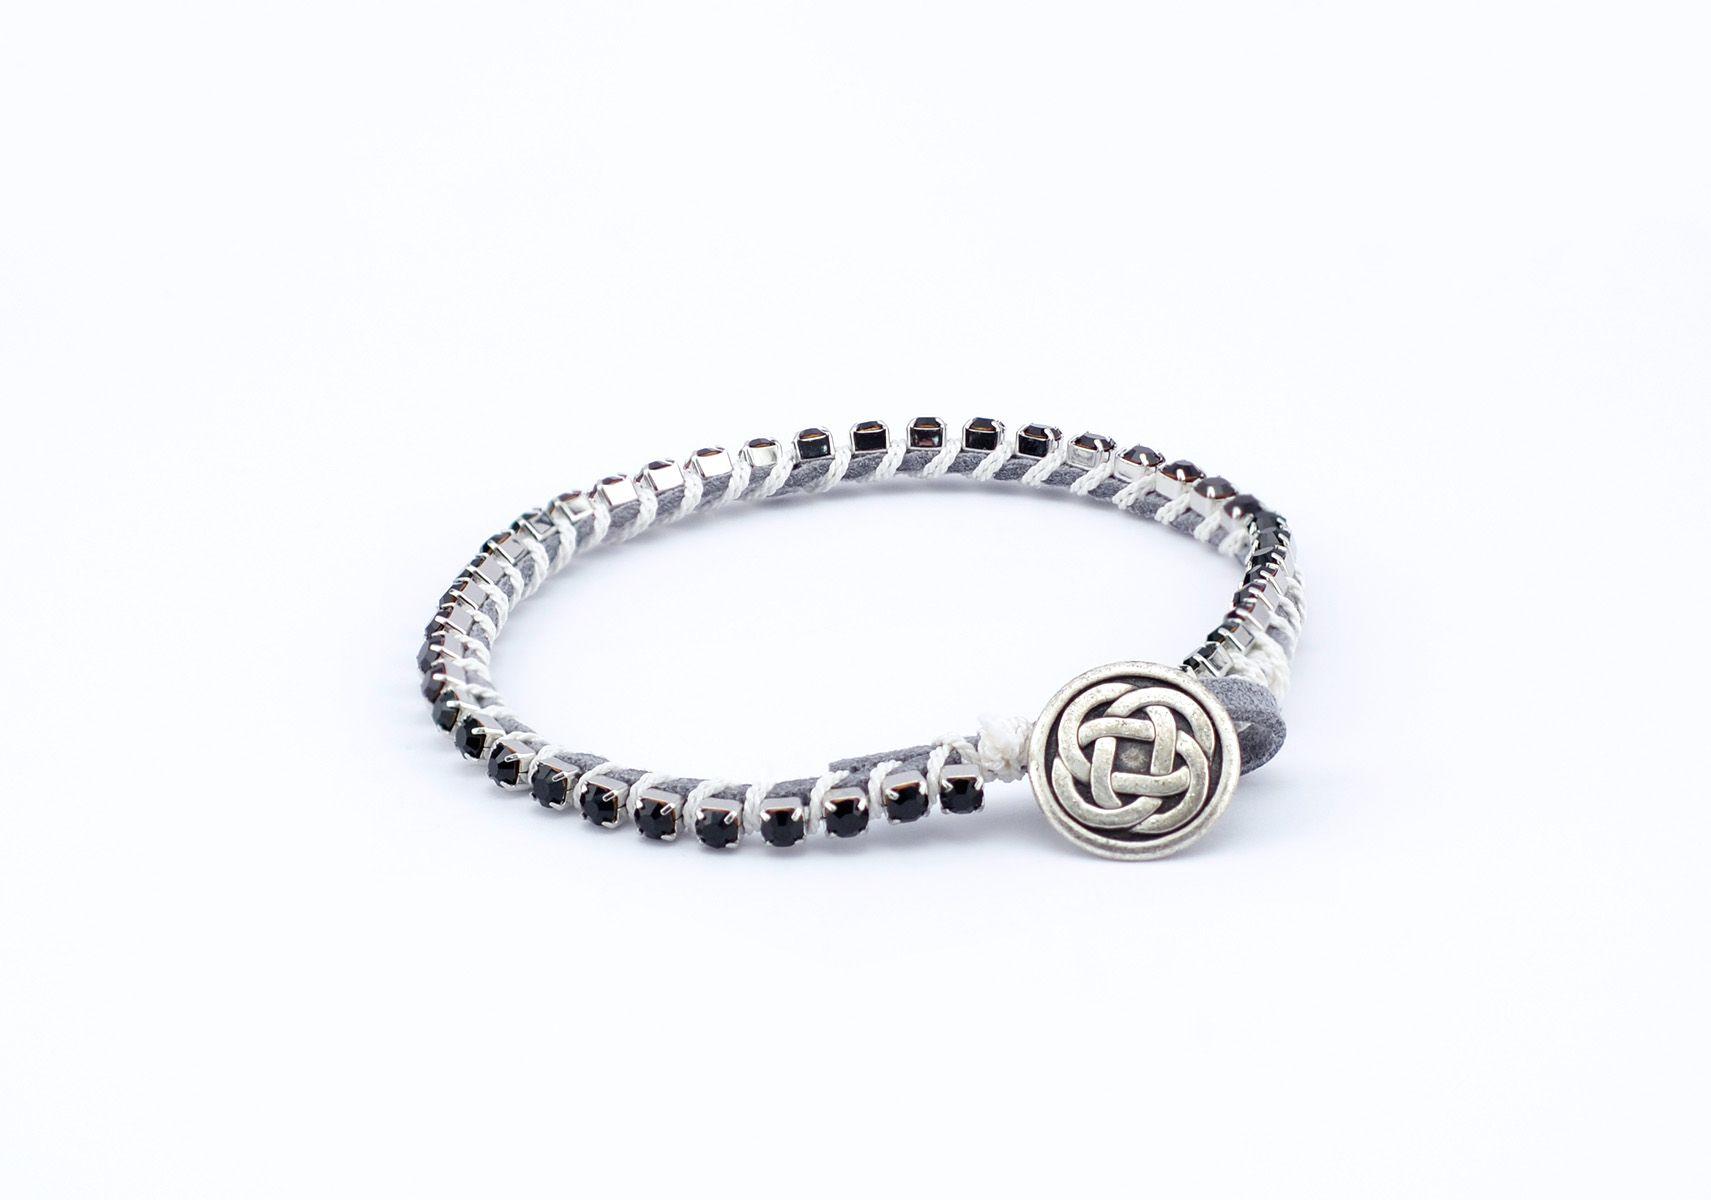 Jskit Jtv Cup Chain Bracelet Kit